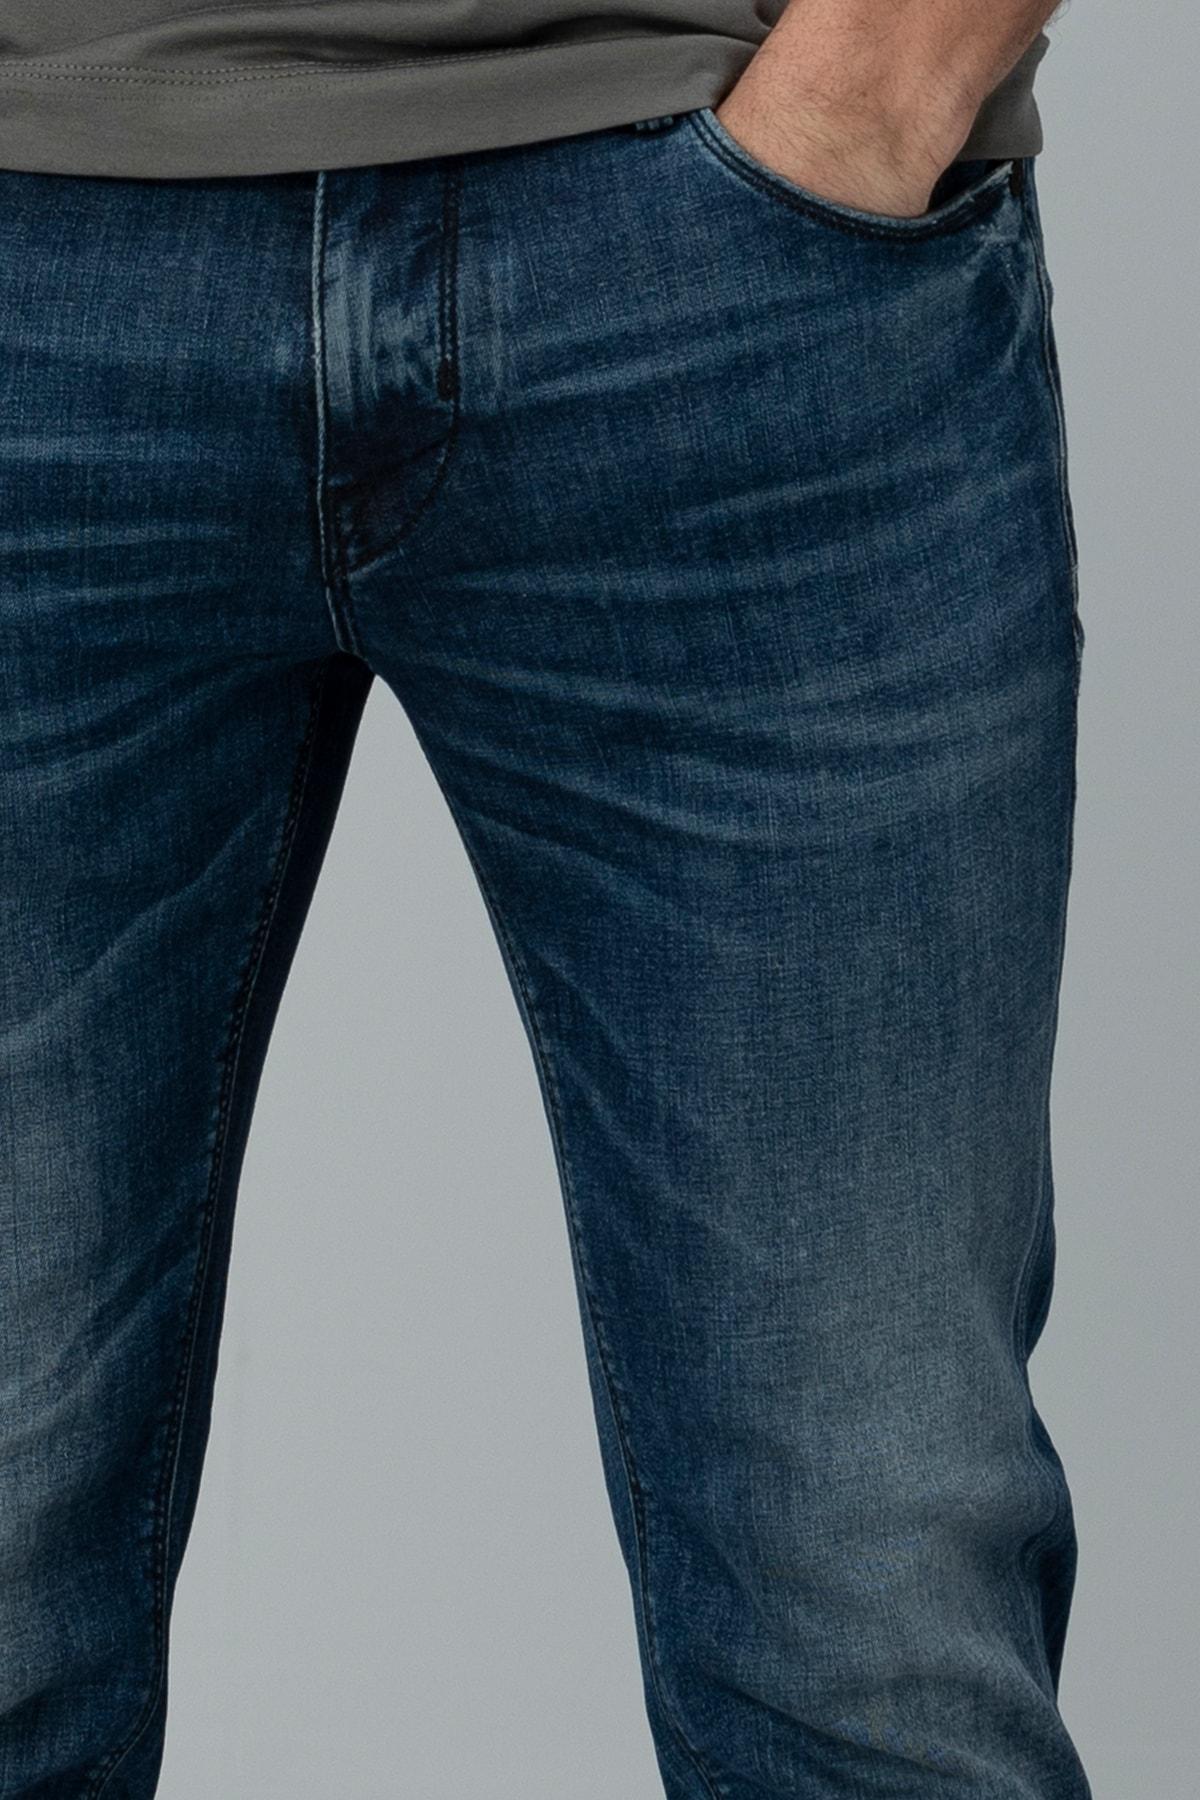 Lufian Aury Smart Jean Pantolon Slim Fit Koyu Mavi 1